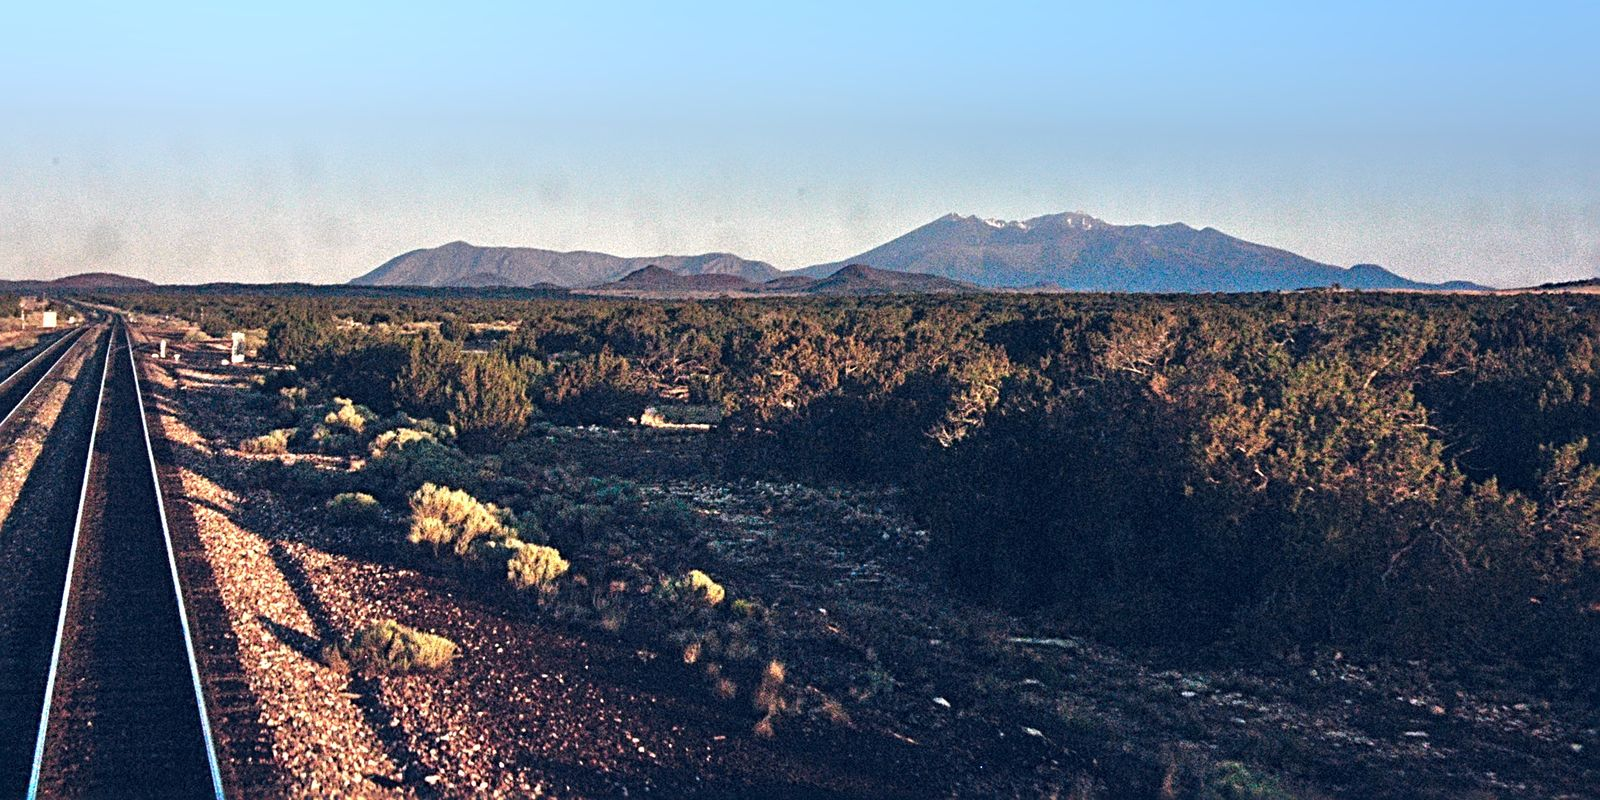 San Francisco Peaks east of Flagstaff AZ USA